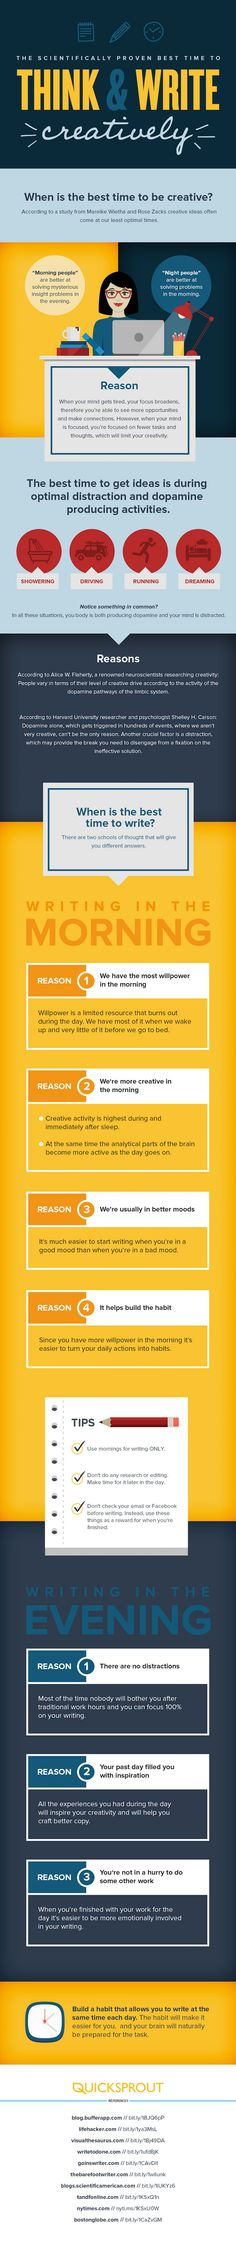 11 Writing Tips and Tricks that Enhance Creativity. #NaNoWriMo #writingtips